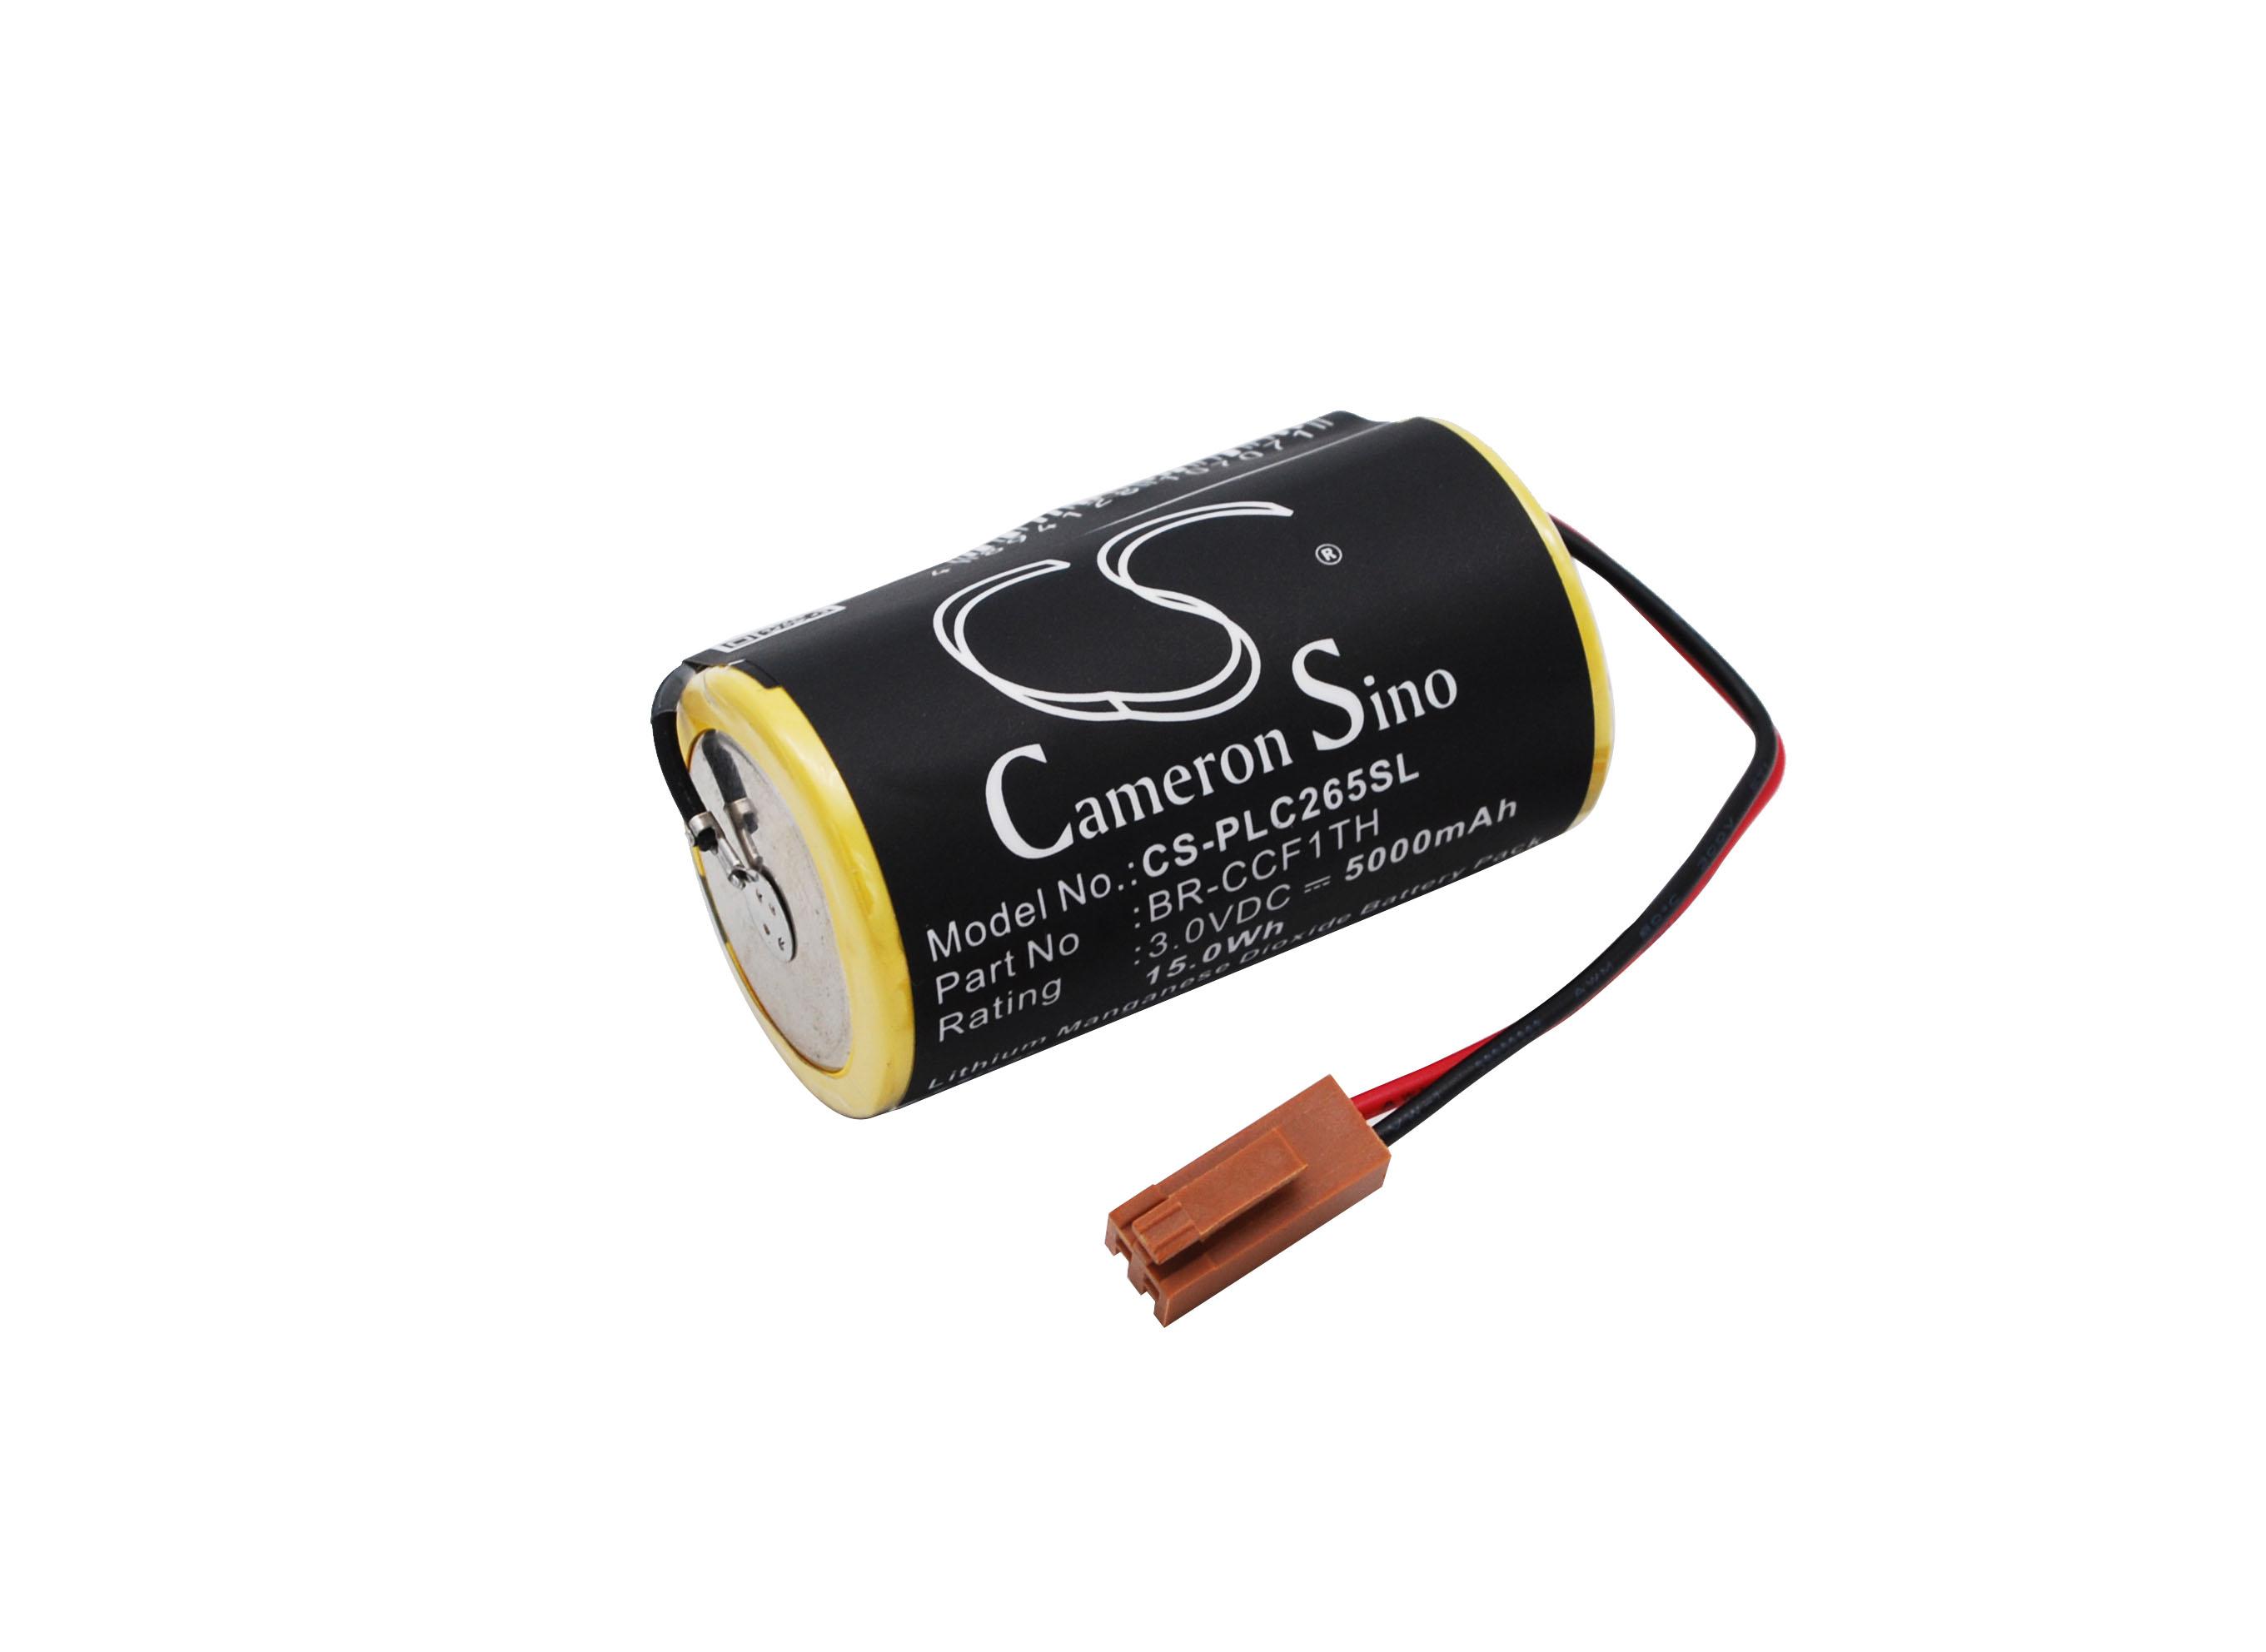 Cameron Sino baterie plc pro GE Fanuc CNC 16i 3V Li-MnO2 5000mAh žlutá - neoriginální